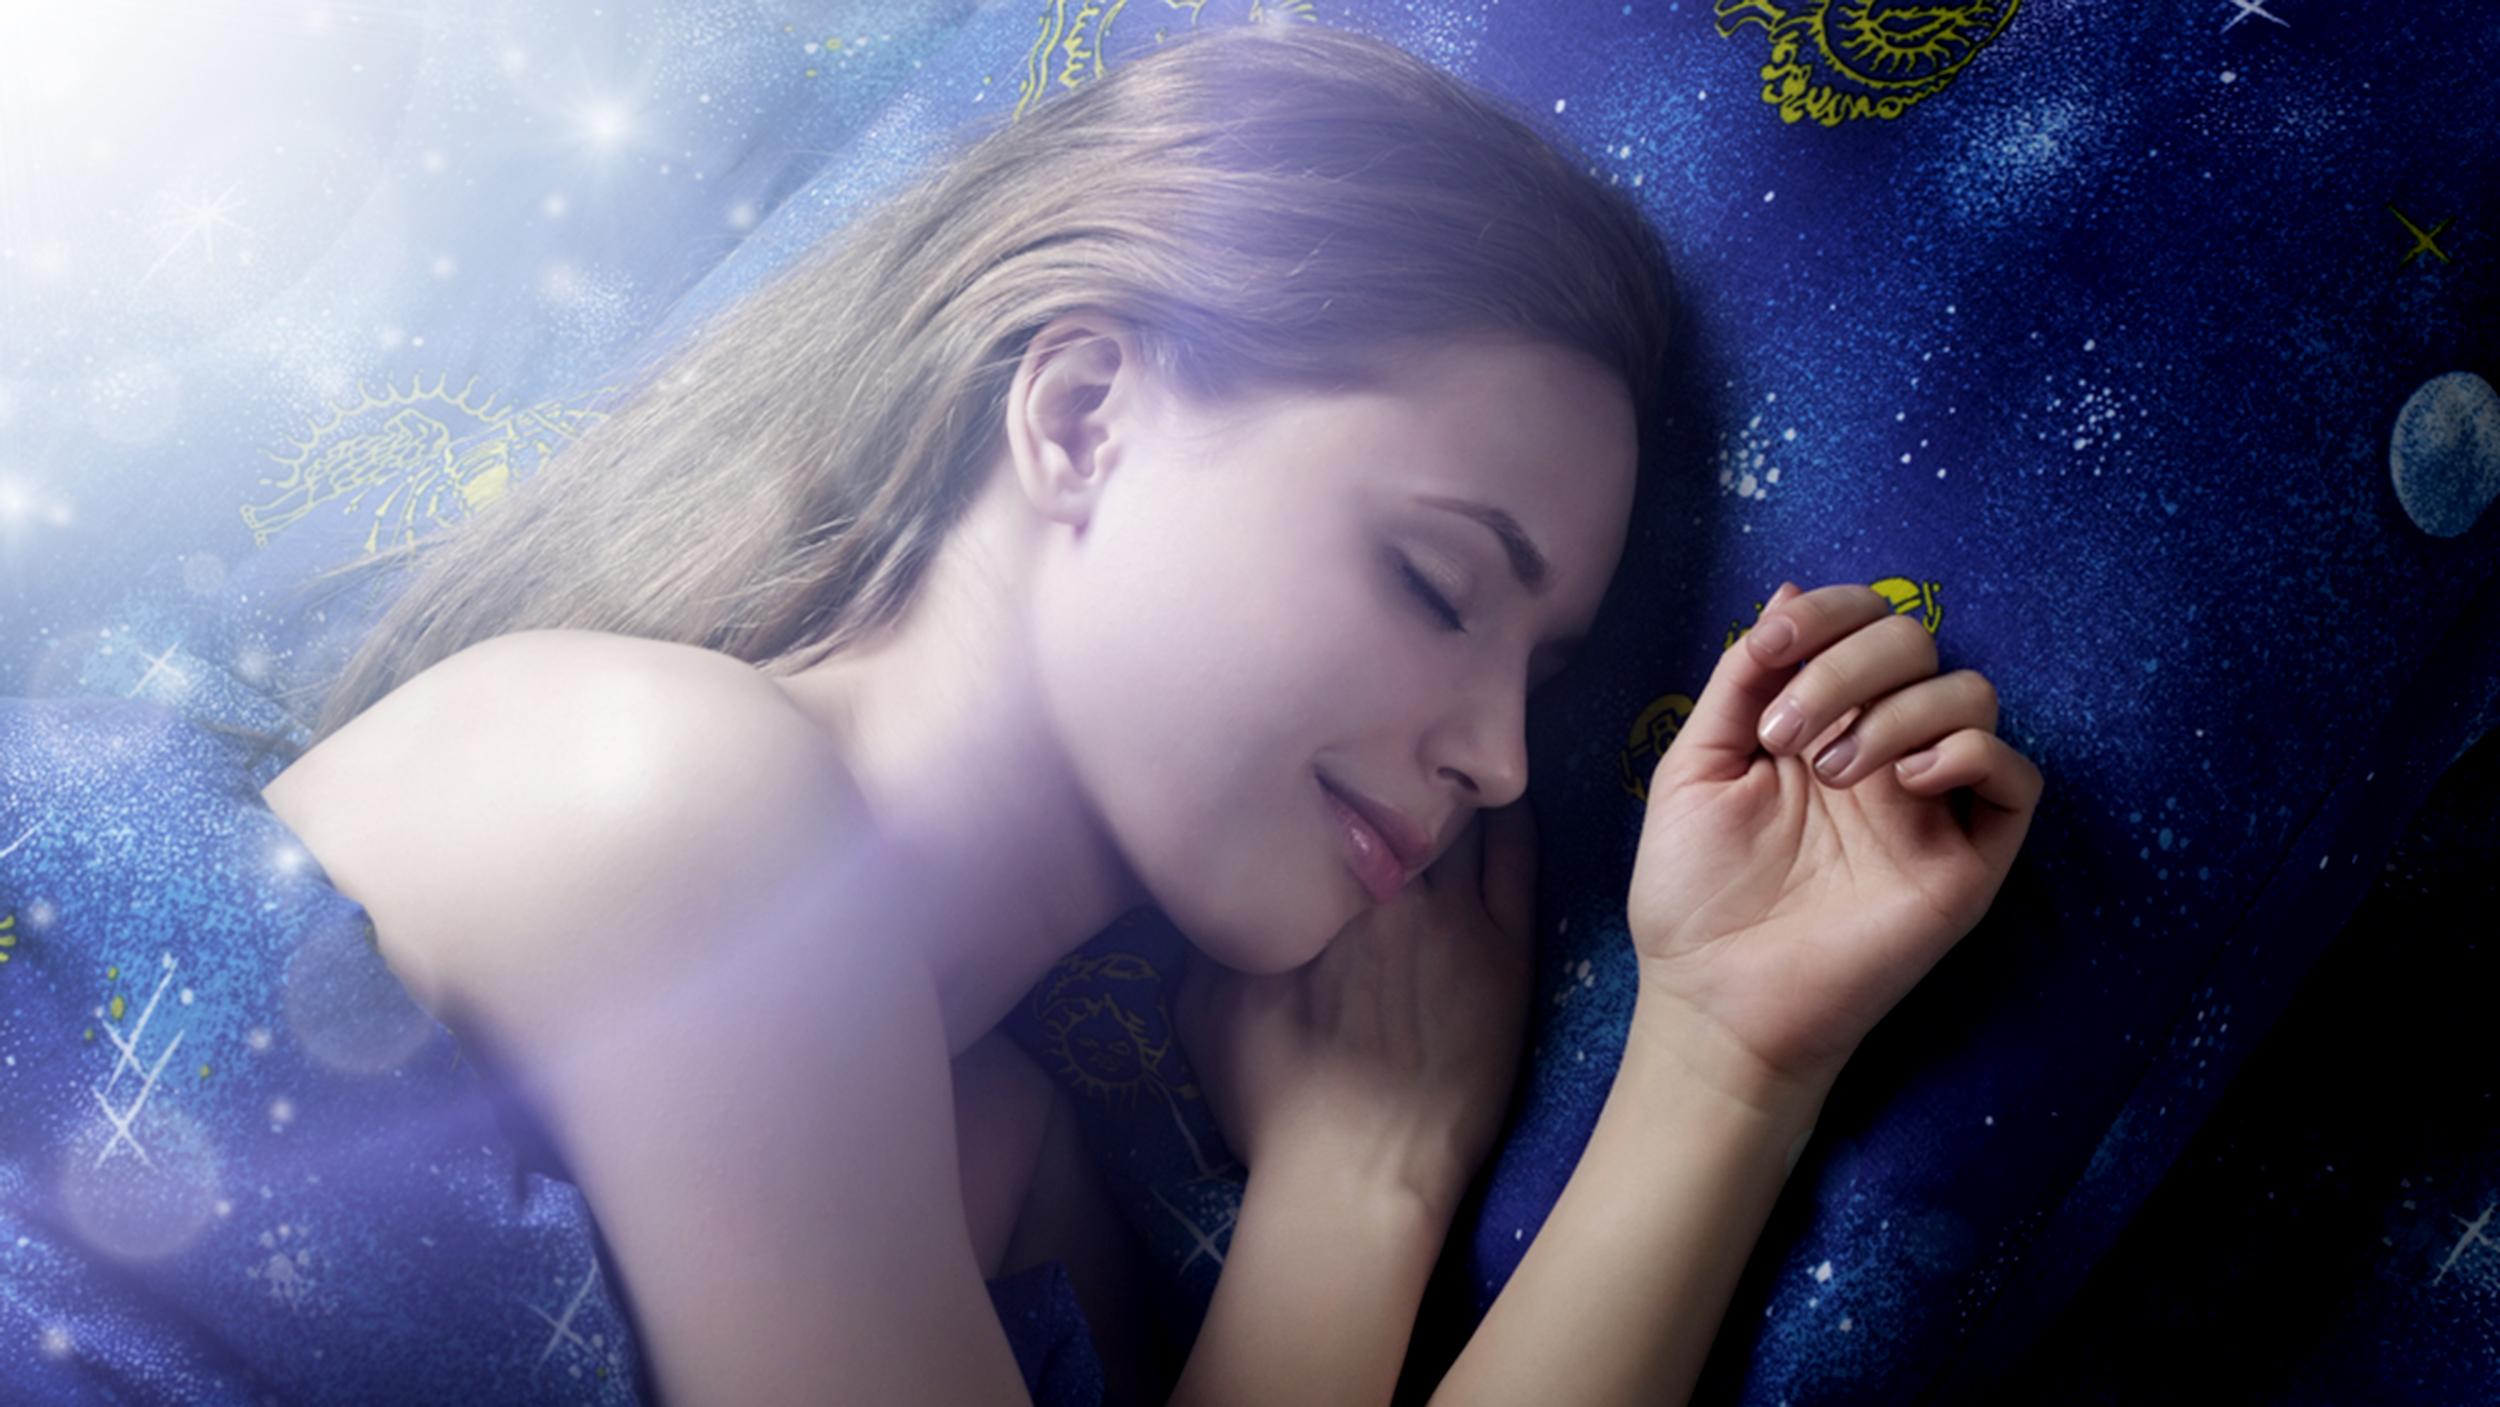 Сонник видит свои руки во сне